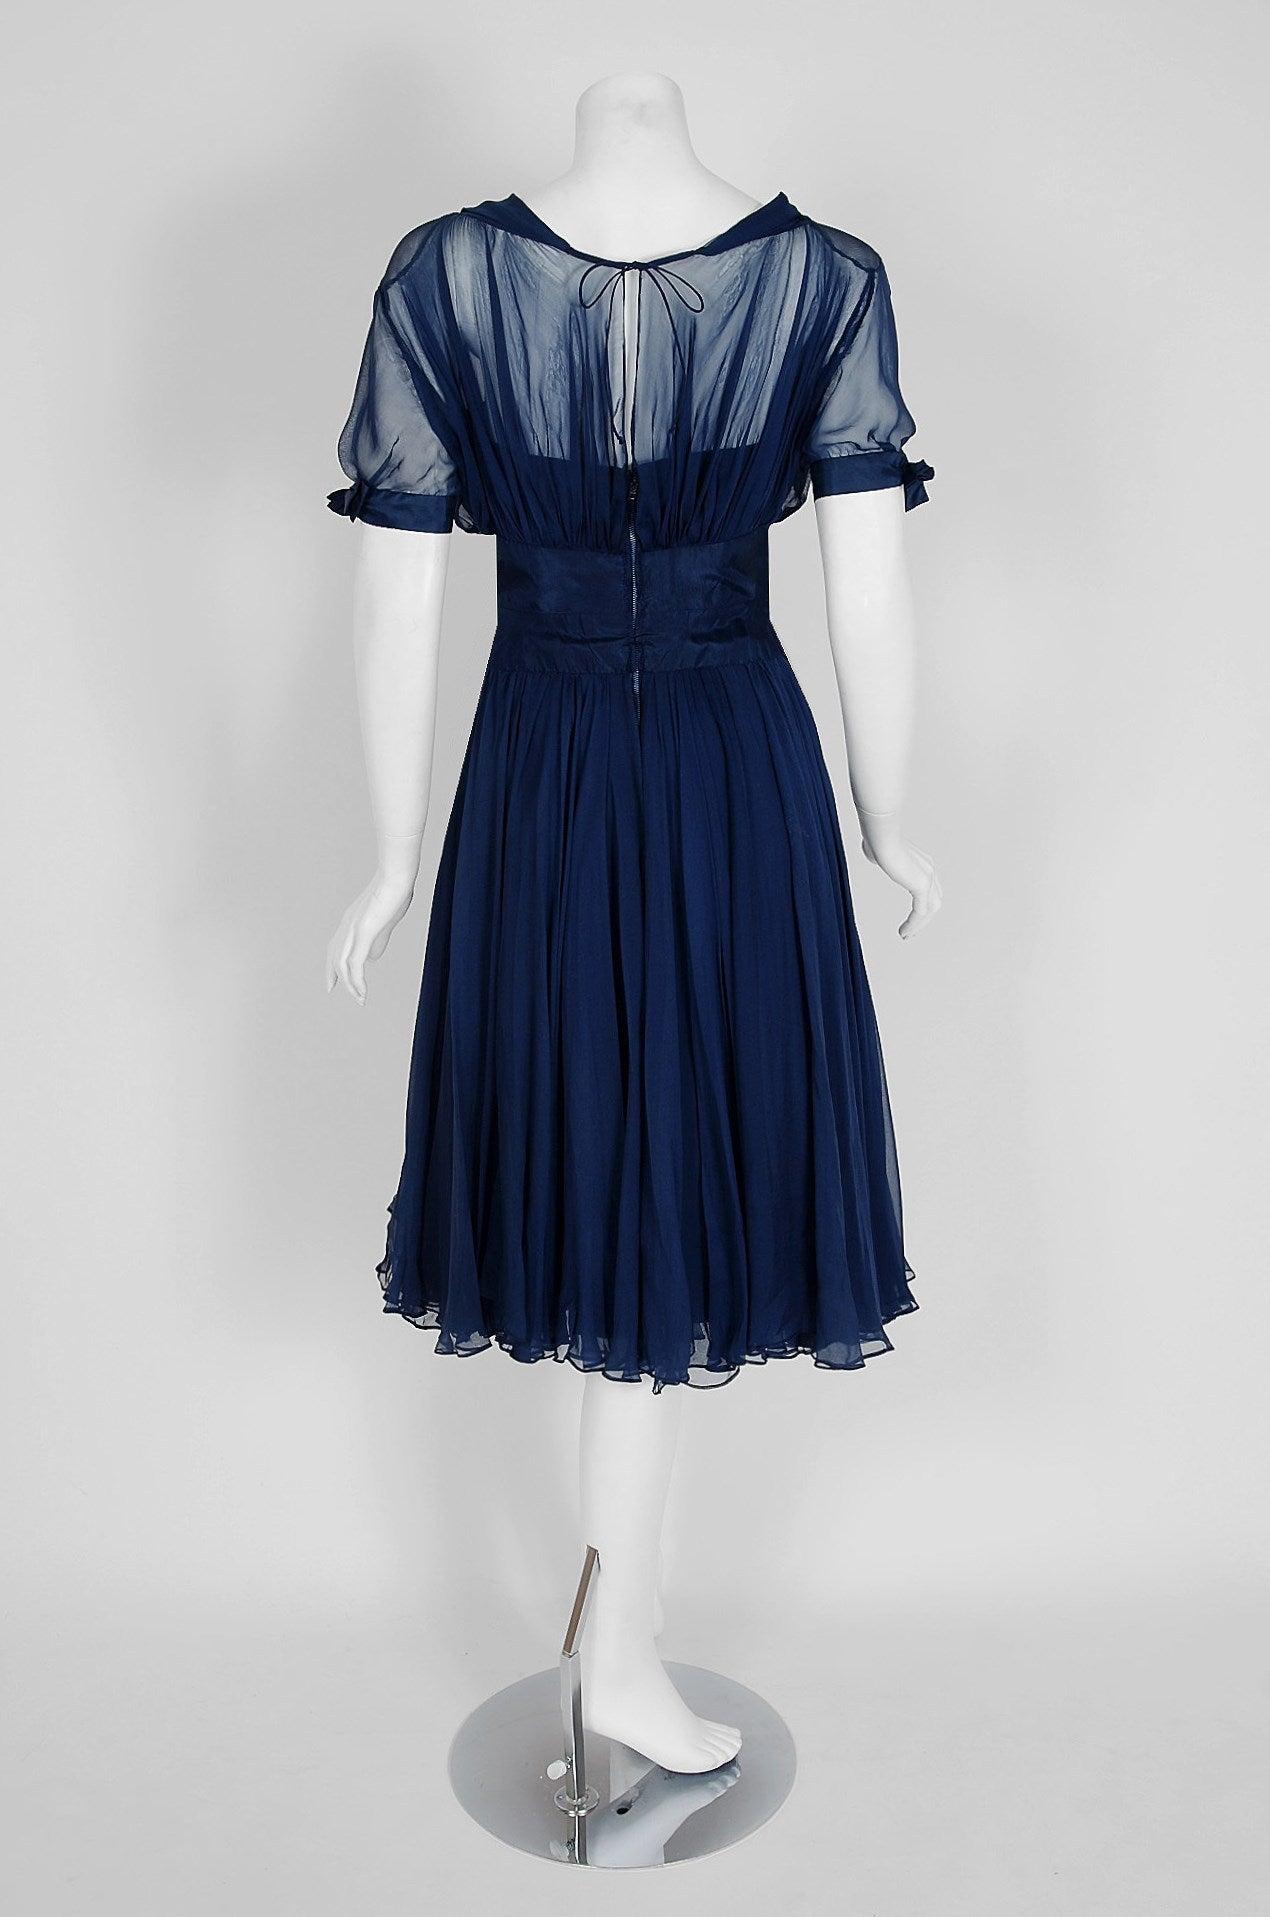 1955 Jean Desses Haute-Couture Sculpted Navy Blue Silk Shelf-Bust Party Dress 6